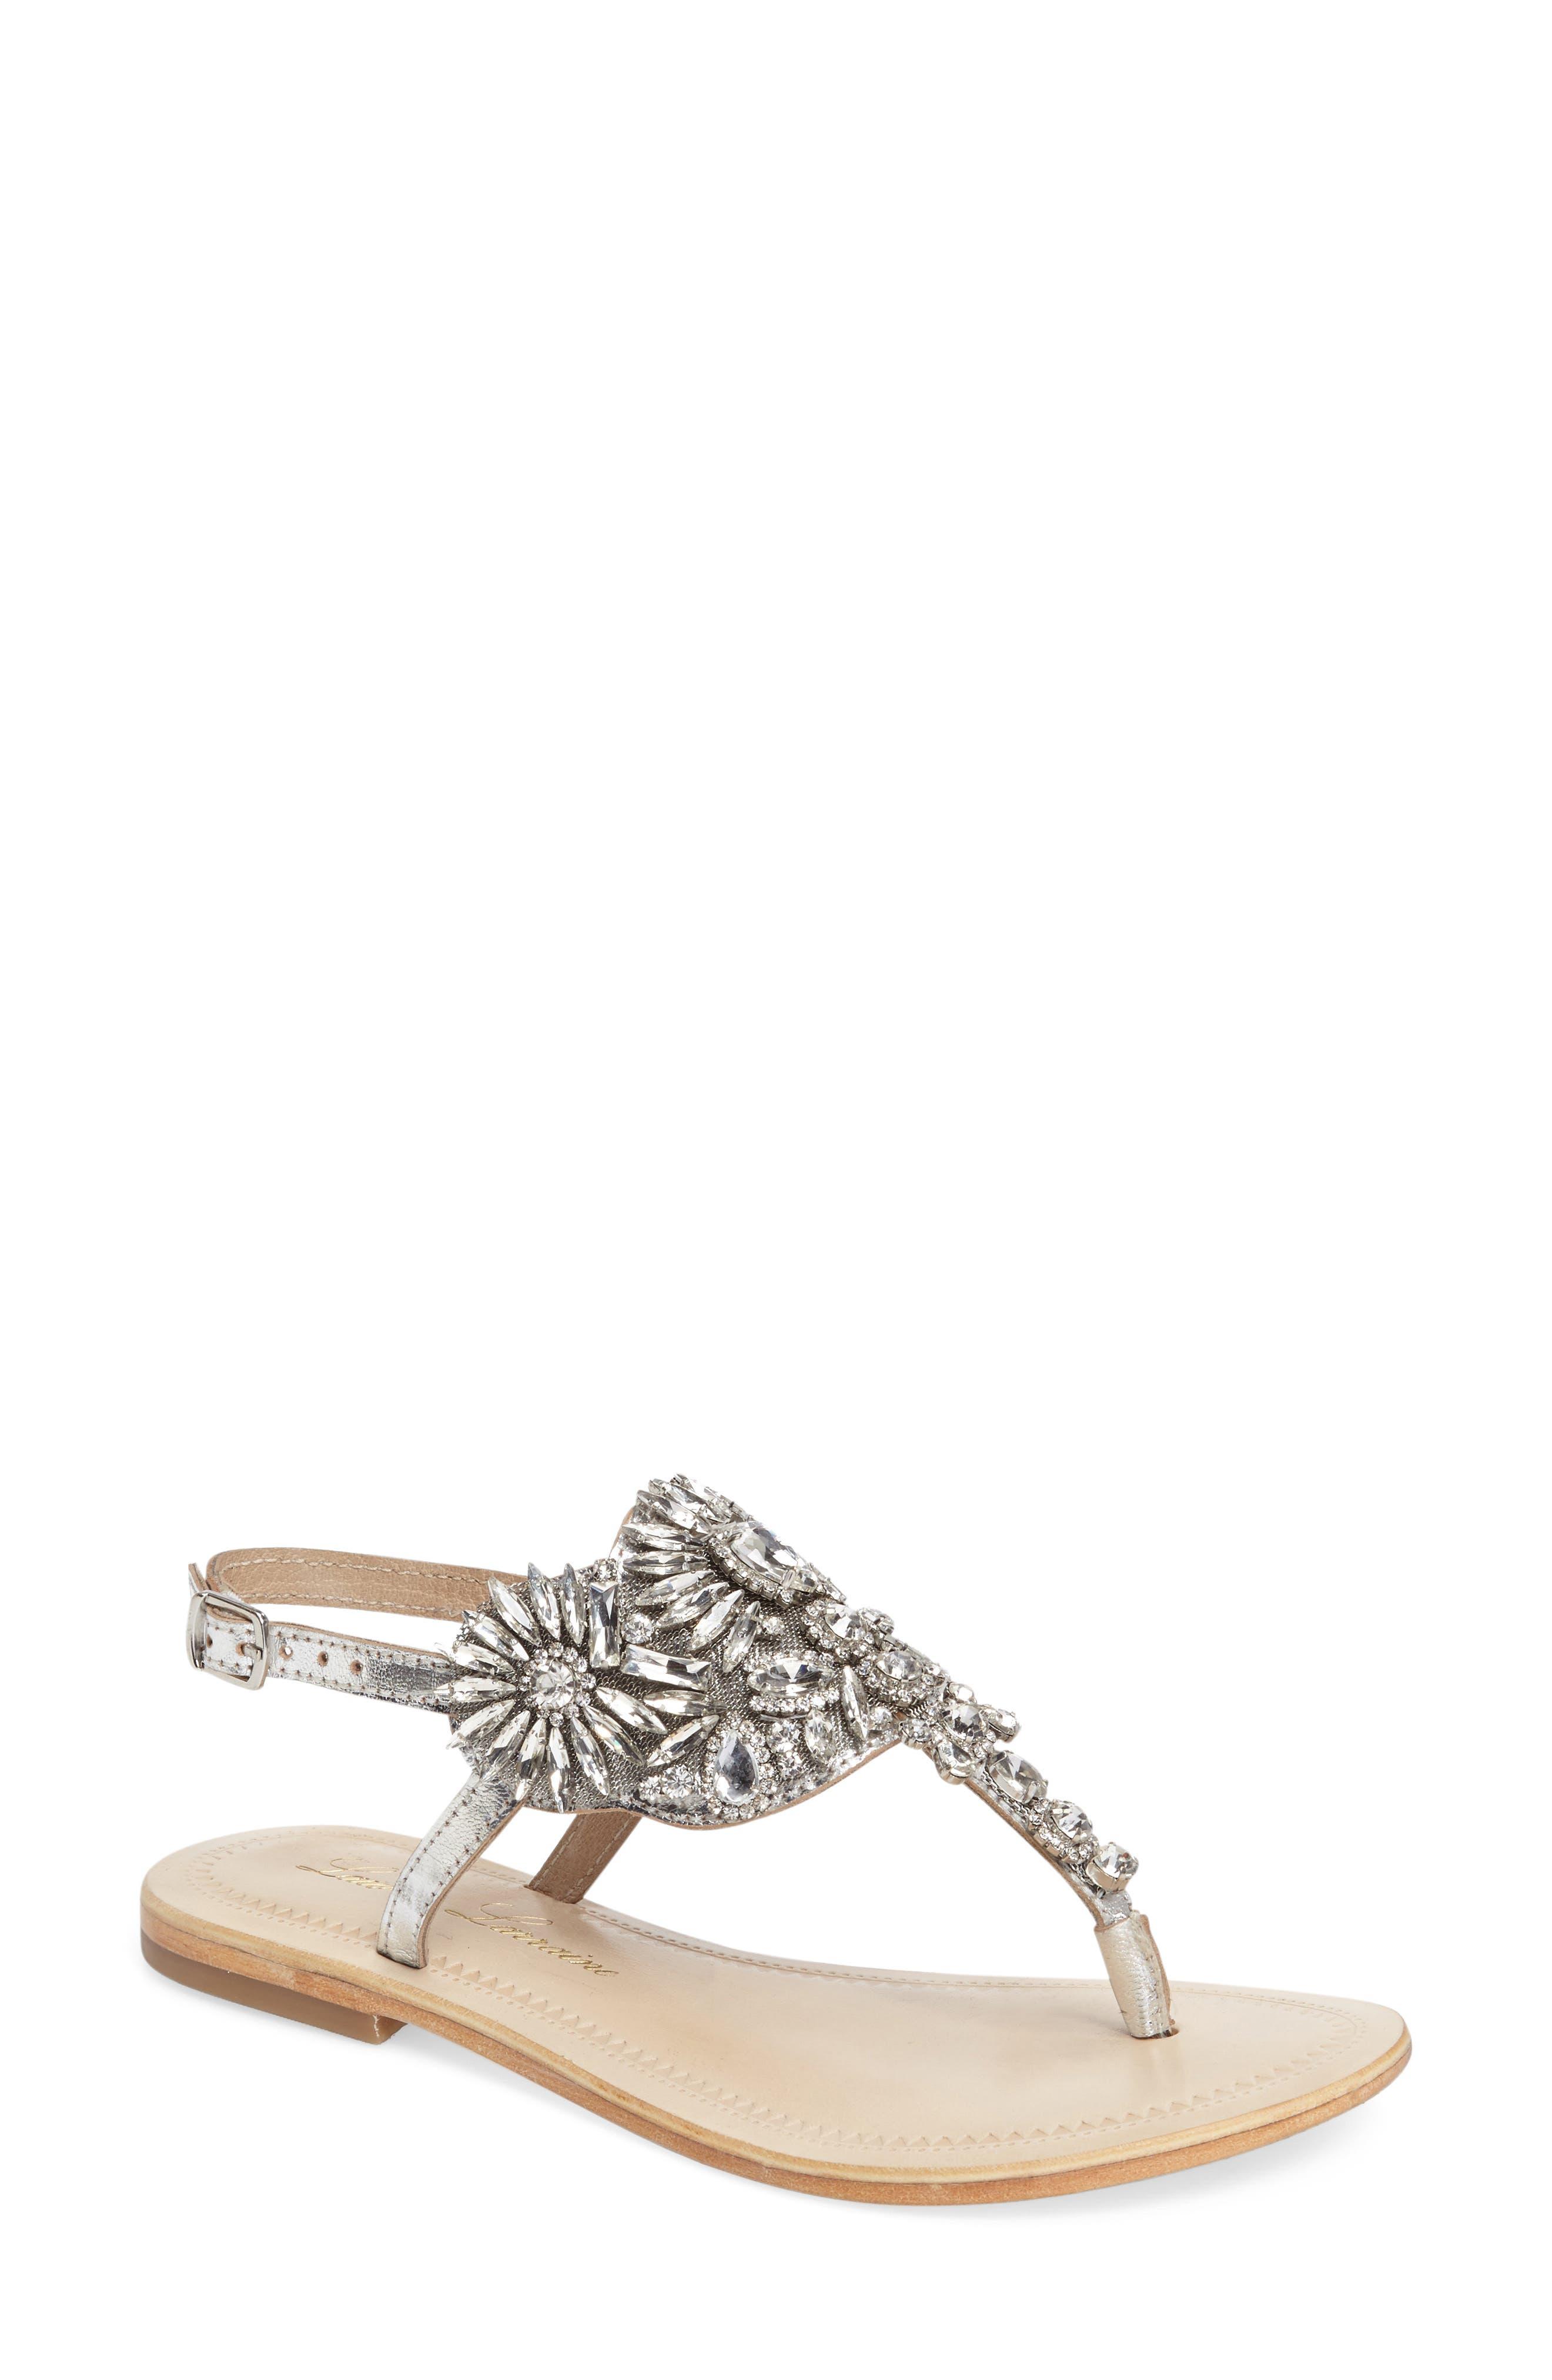 Lauren Lorraine Vera Embellished Sandal